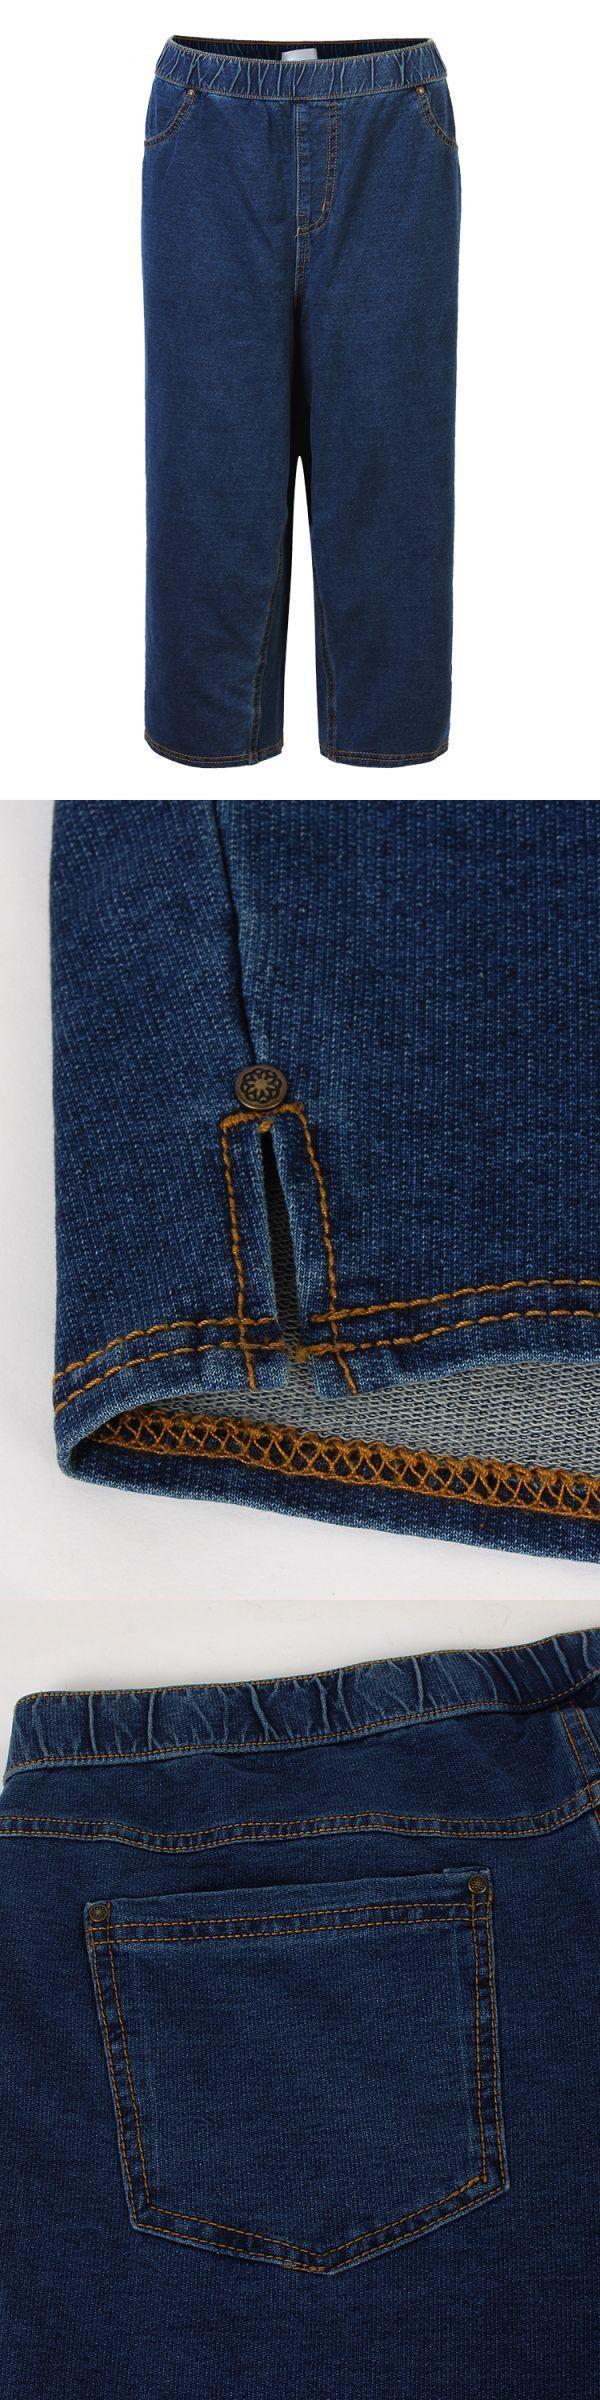 Kohl 8217 S Denim Jeans Loose Women Elastic Waist Pure Color Harem Fifth